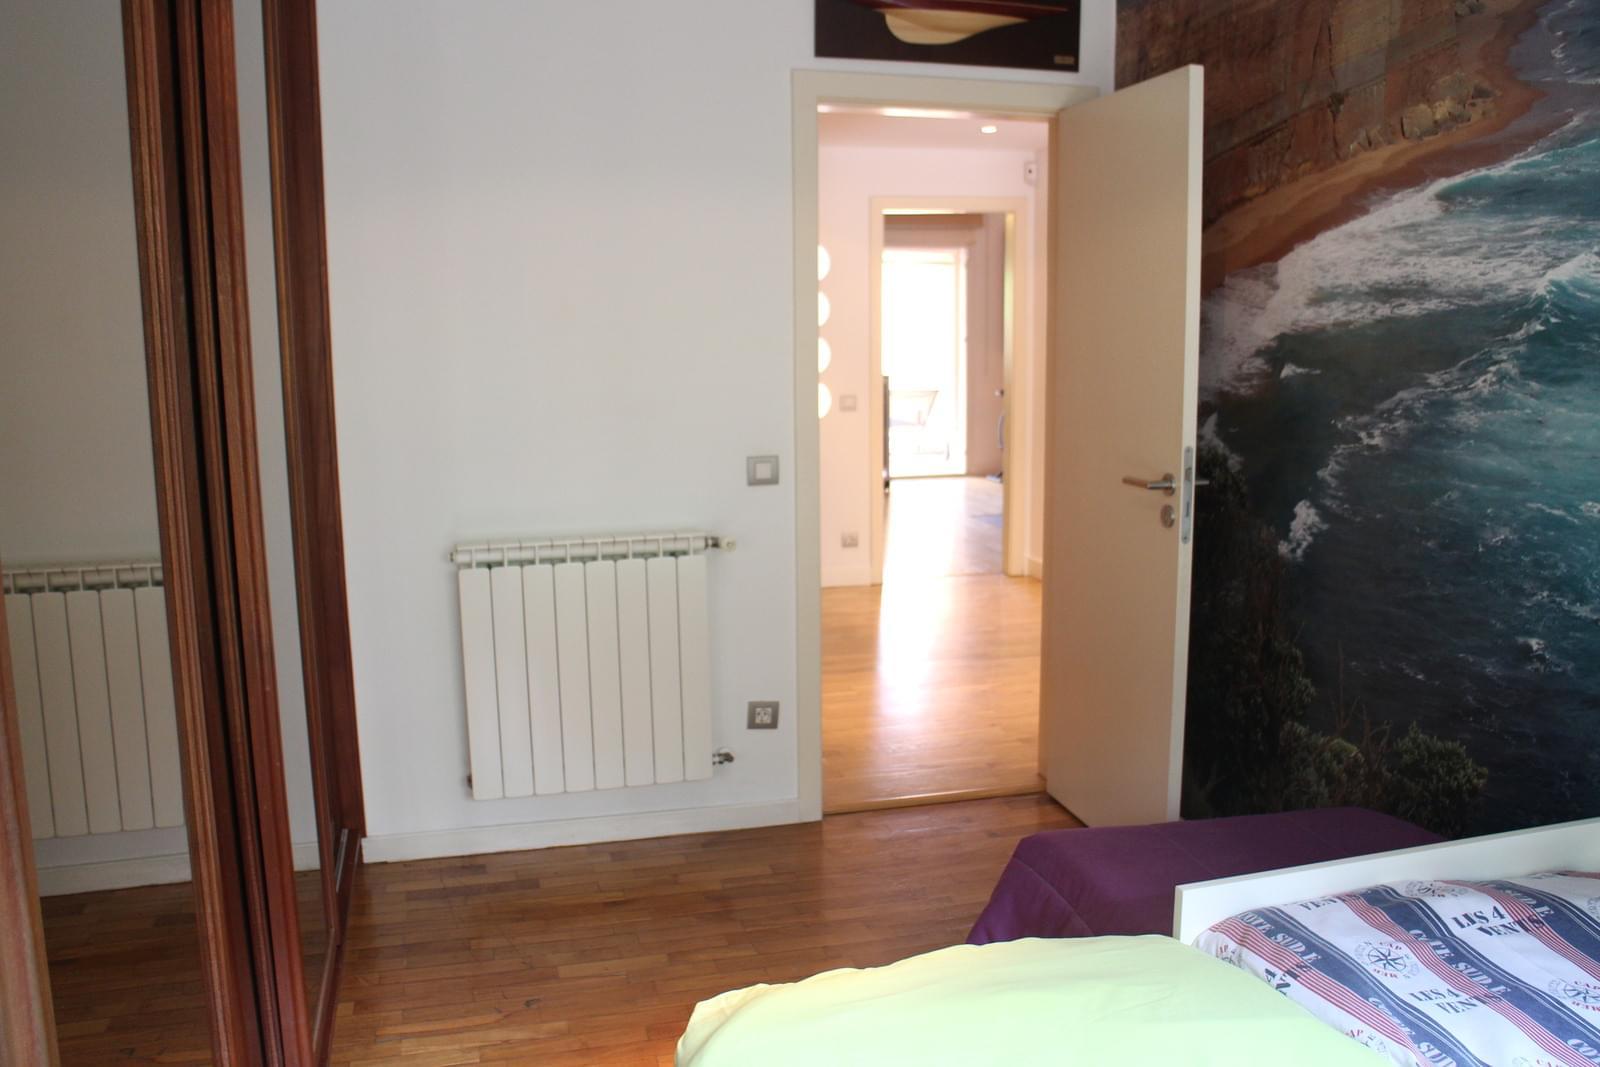 pf17538-apartamento-t2-cascais-05d43625-3190-4232-8d64-6fc1443cd684